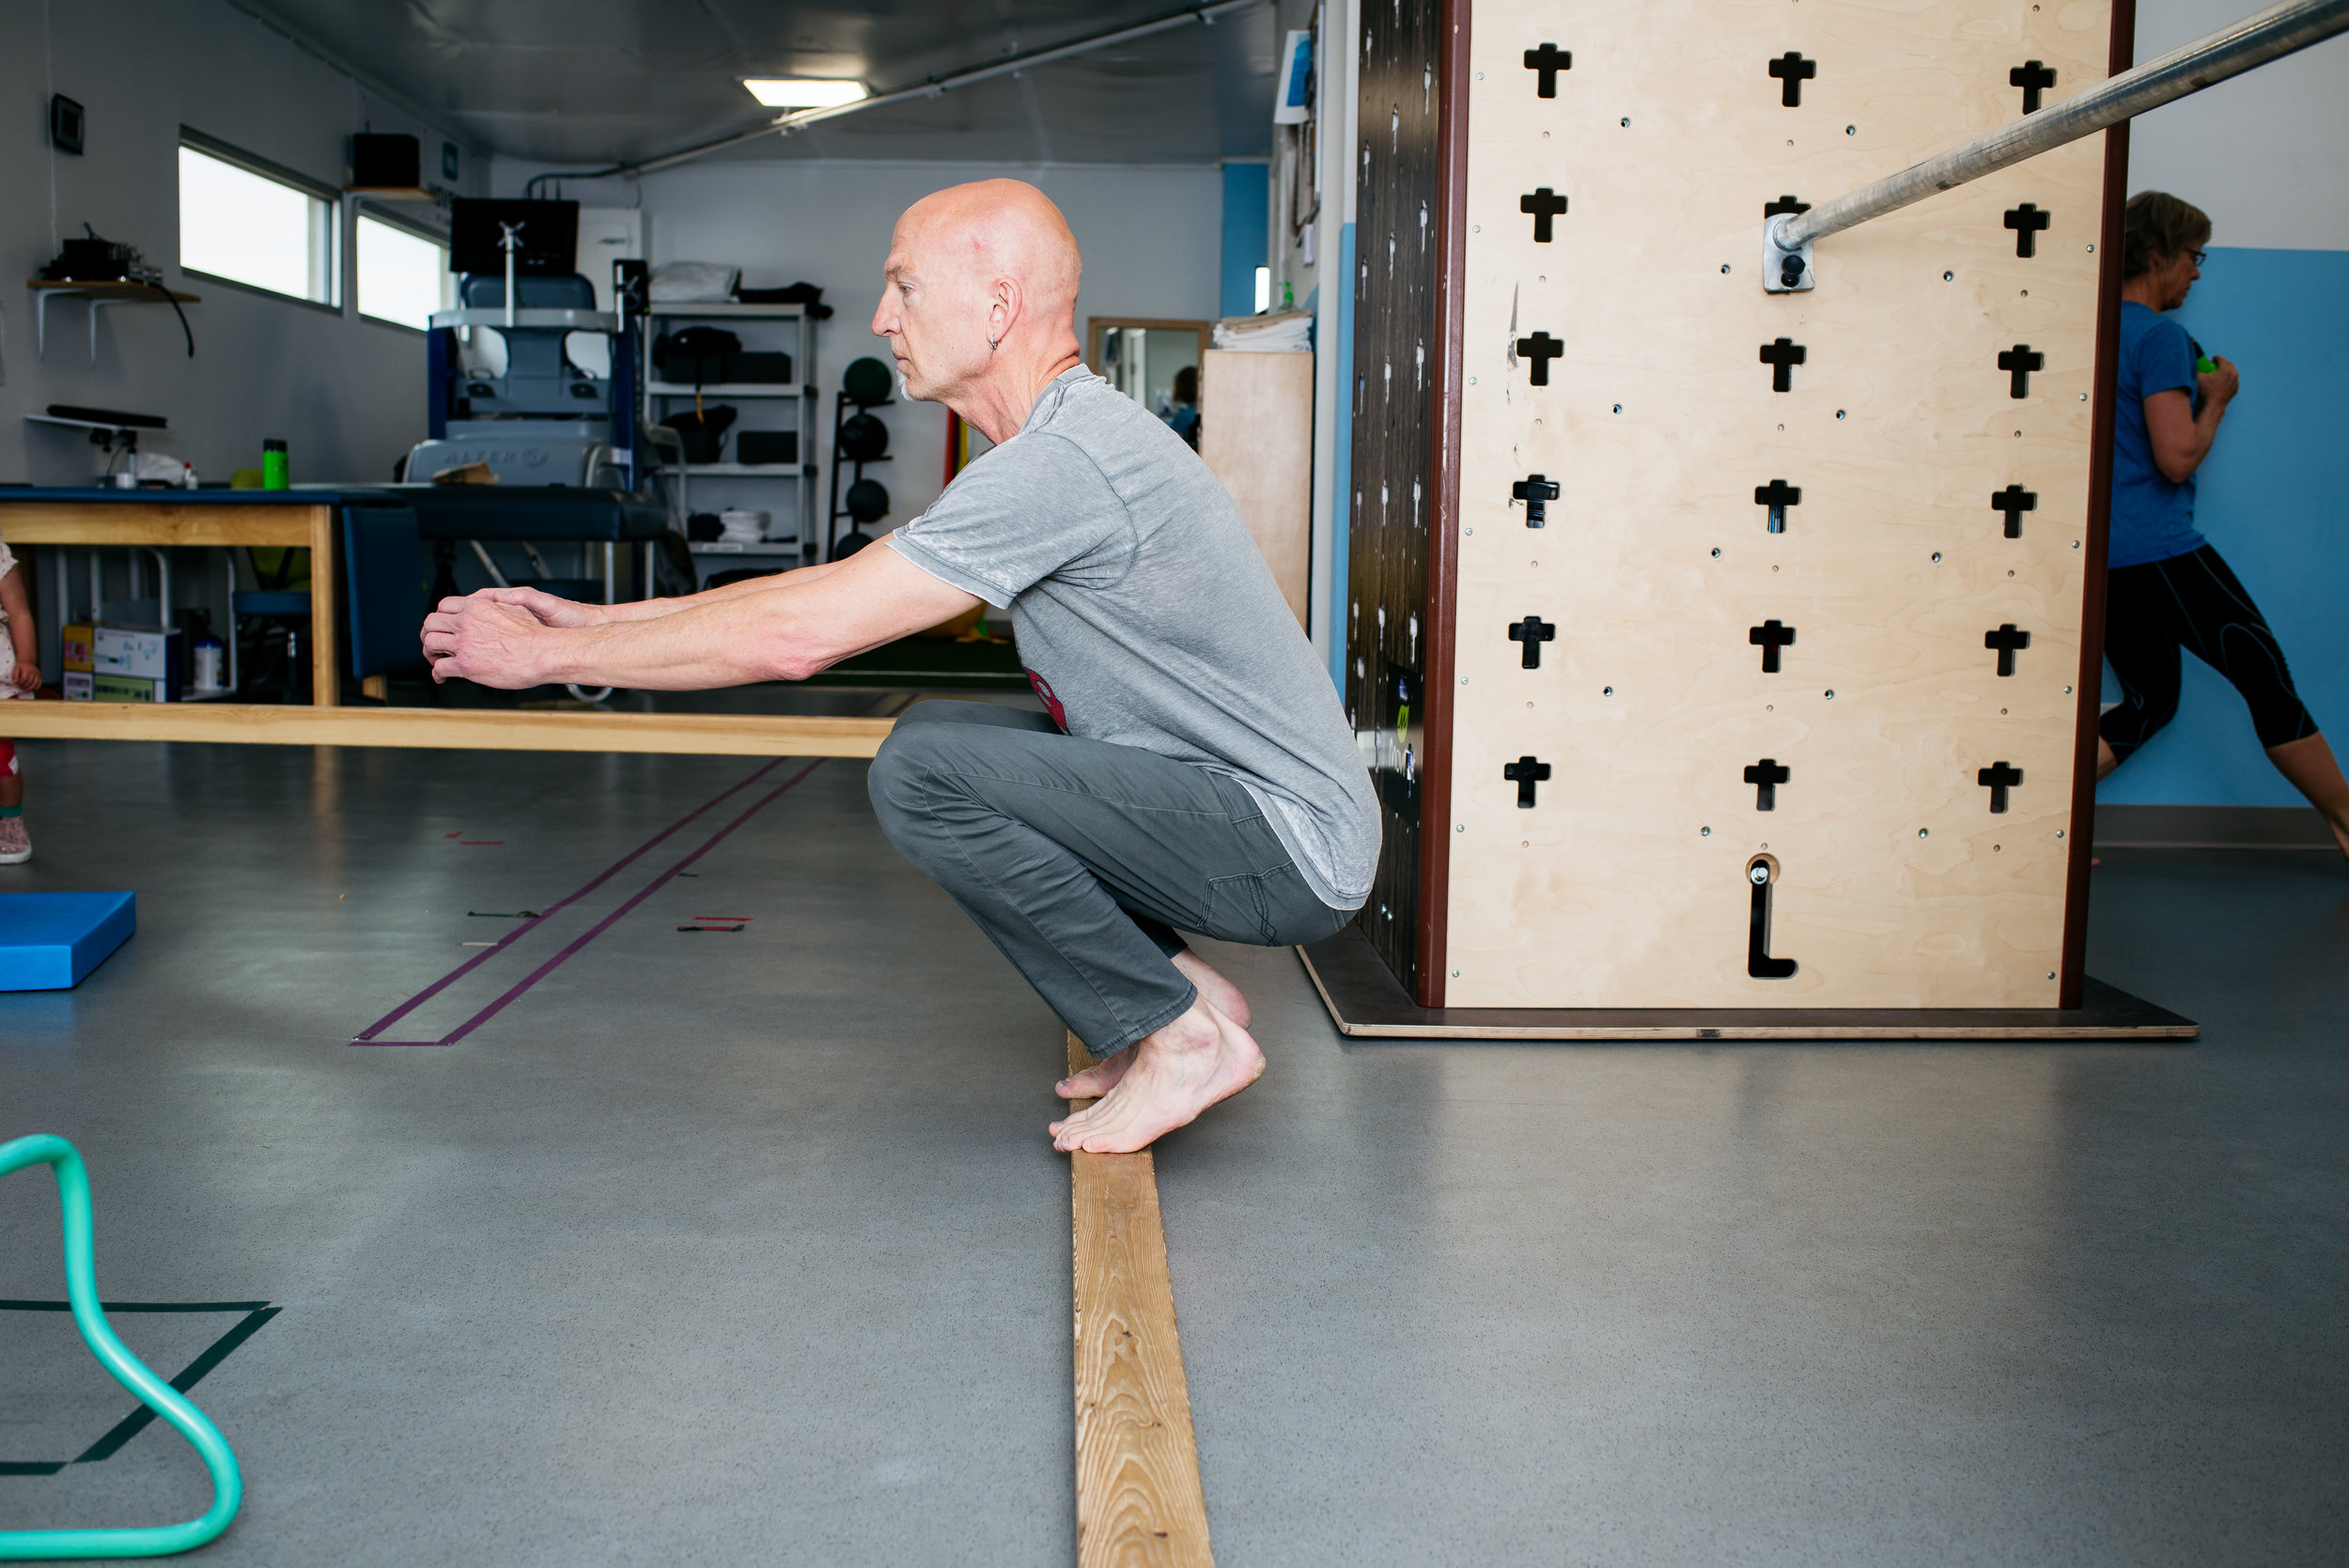 Ed deep squat balance MovNat MoveTru Albuquerque